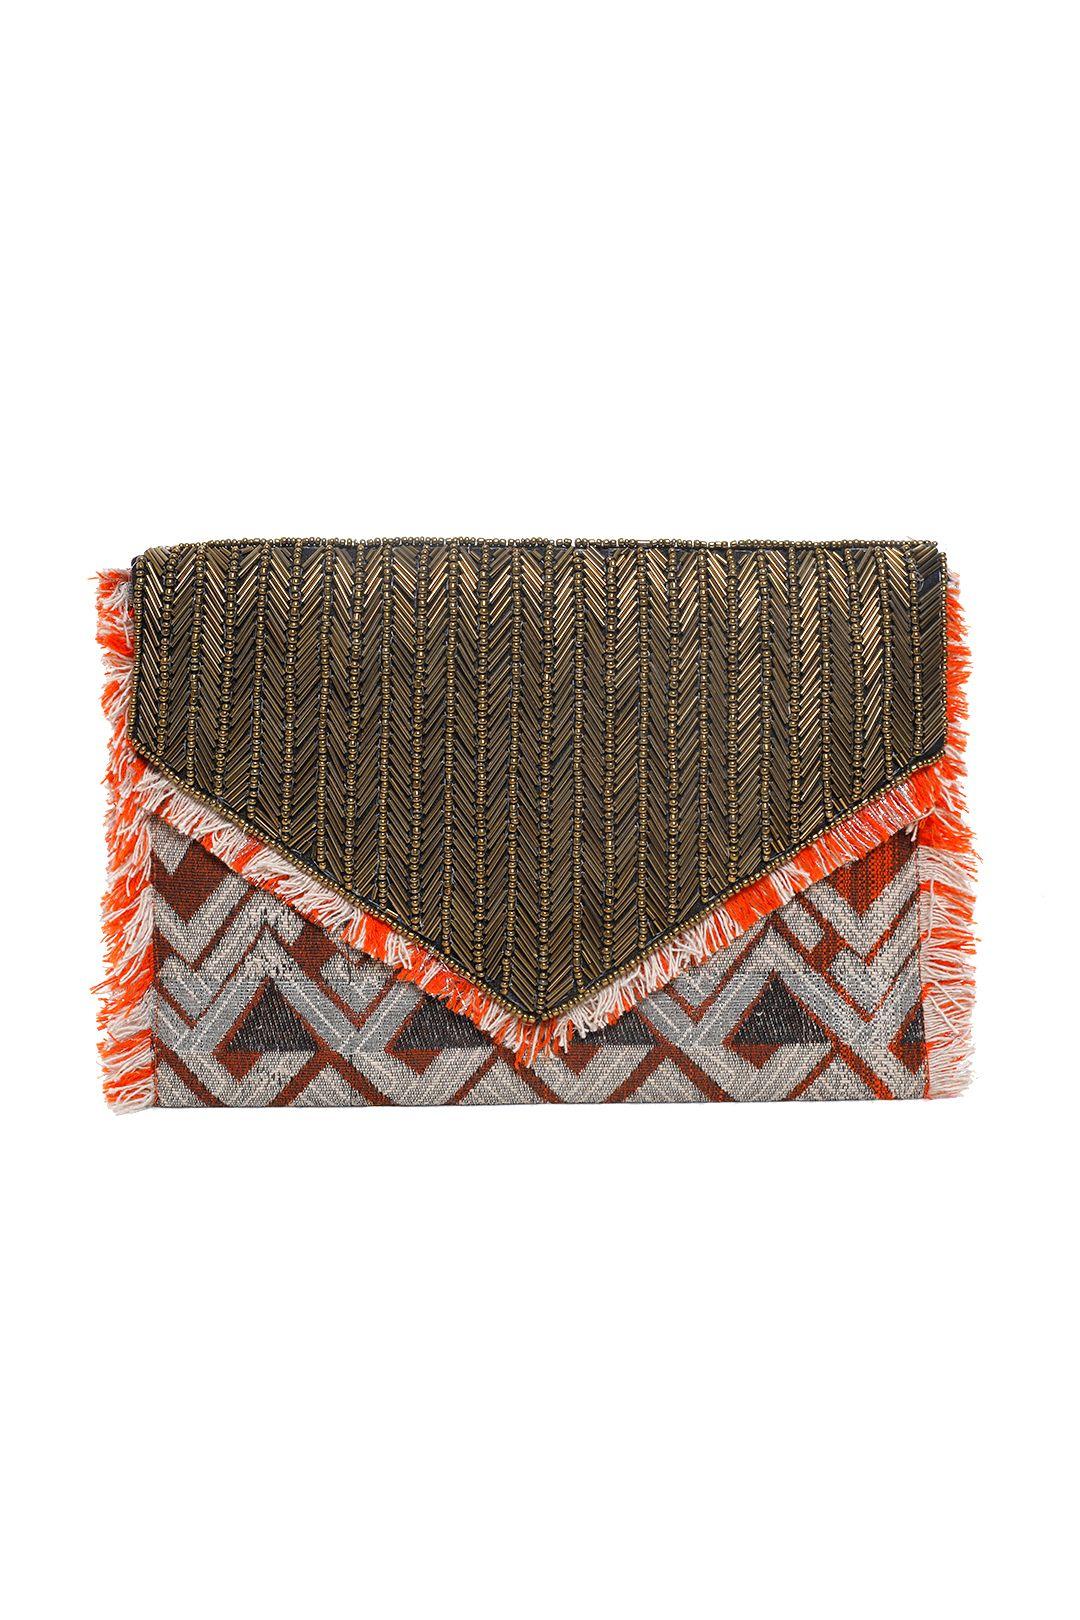 Adorne - Aztec Beaded Tassel Clutch - Orange - Front